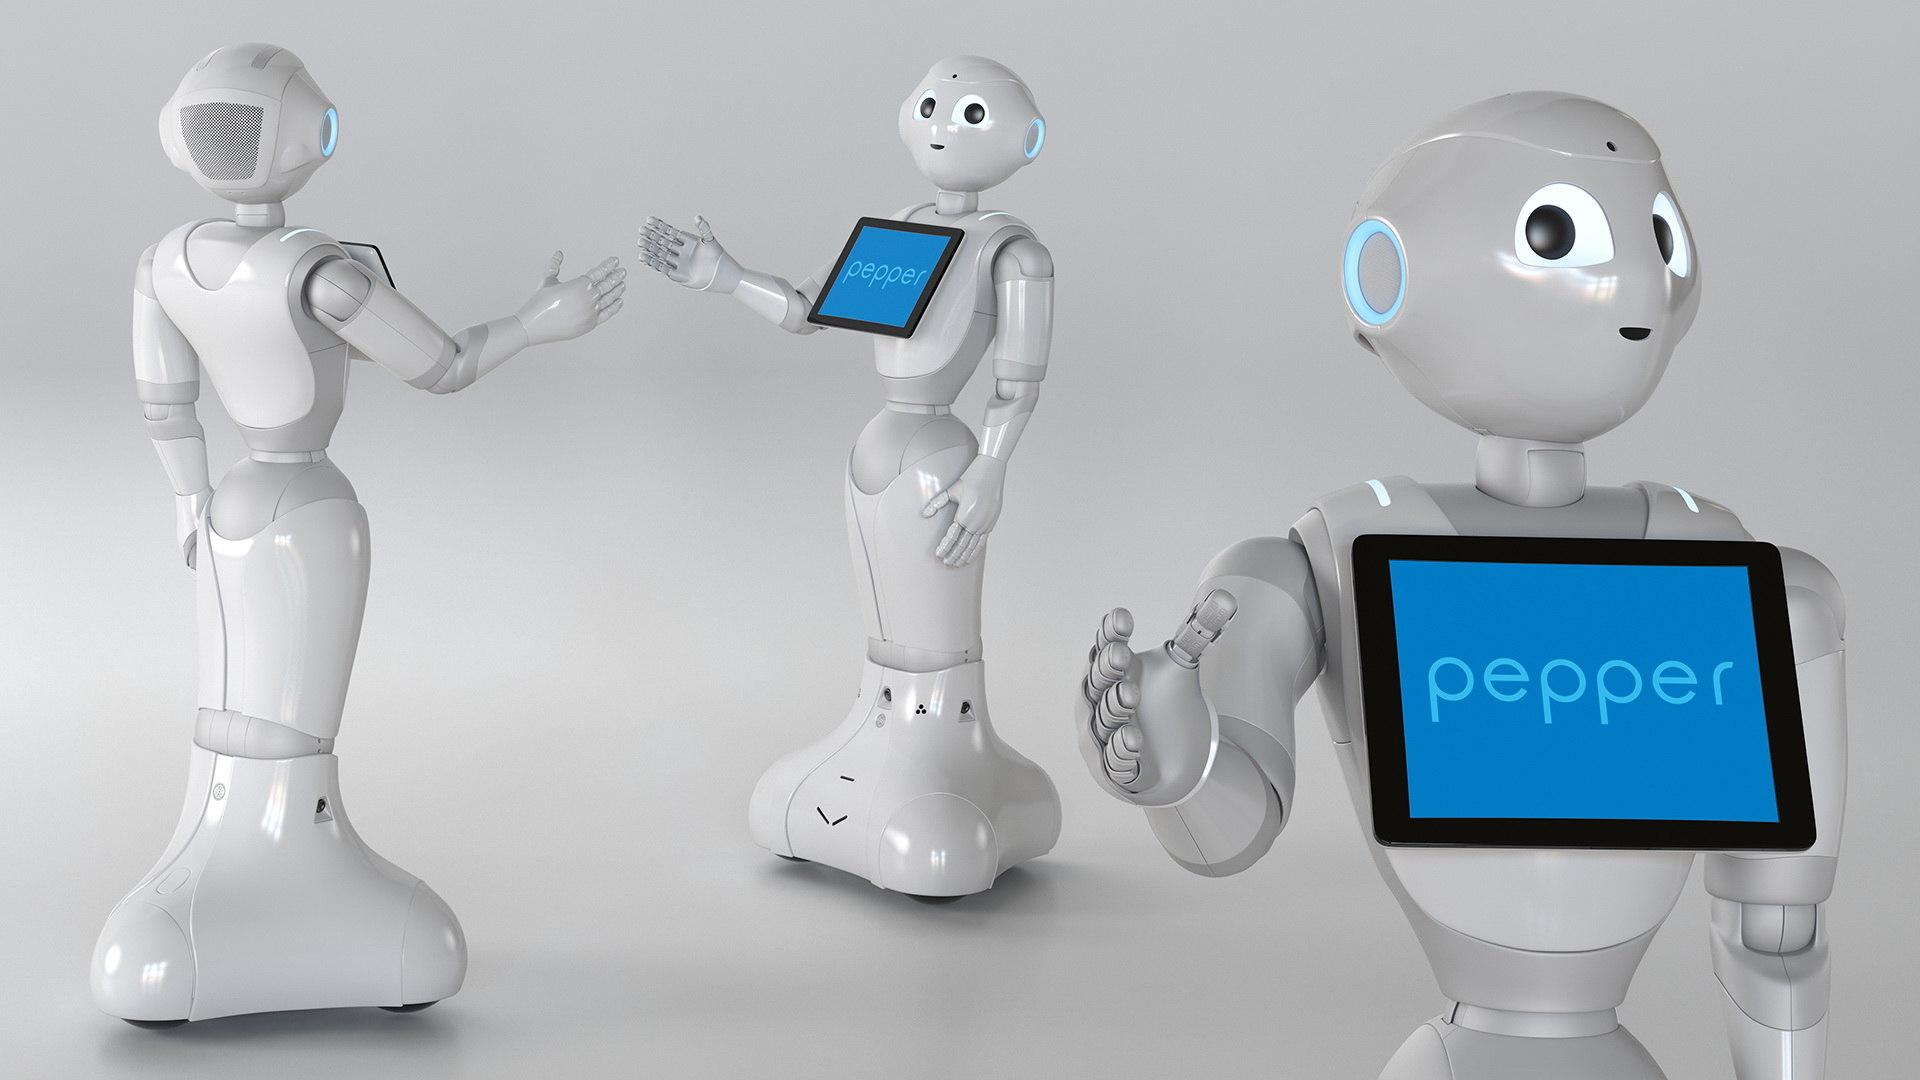 3D Information Display Pepper Robot